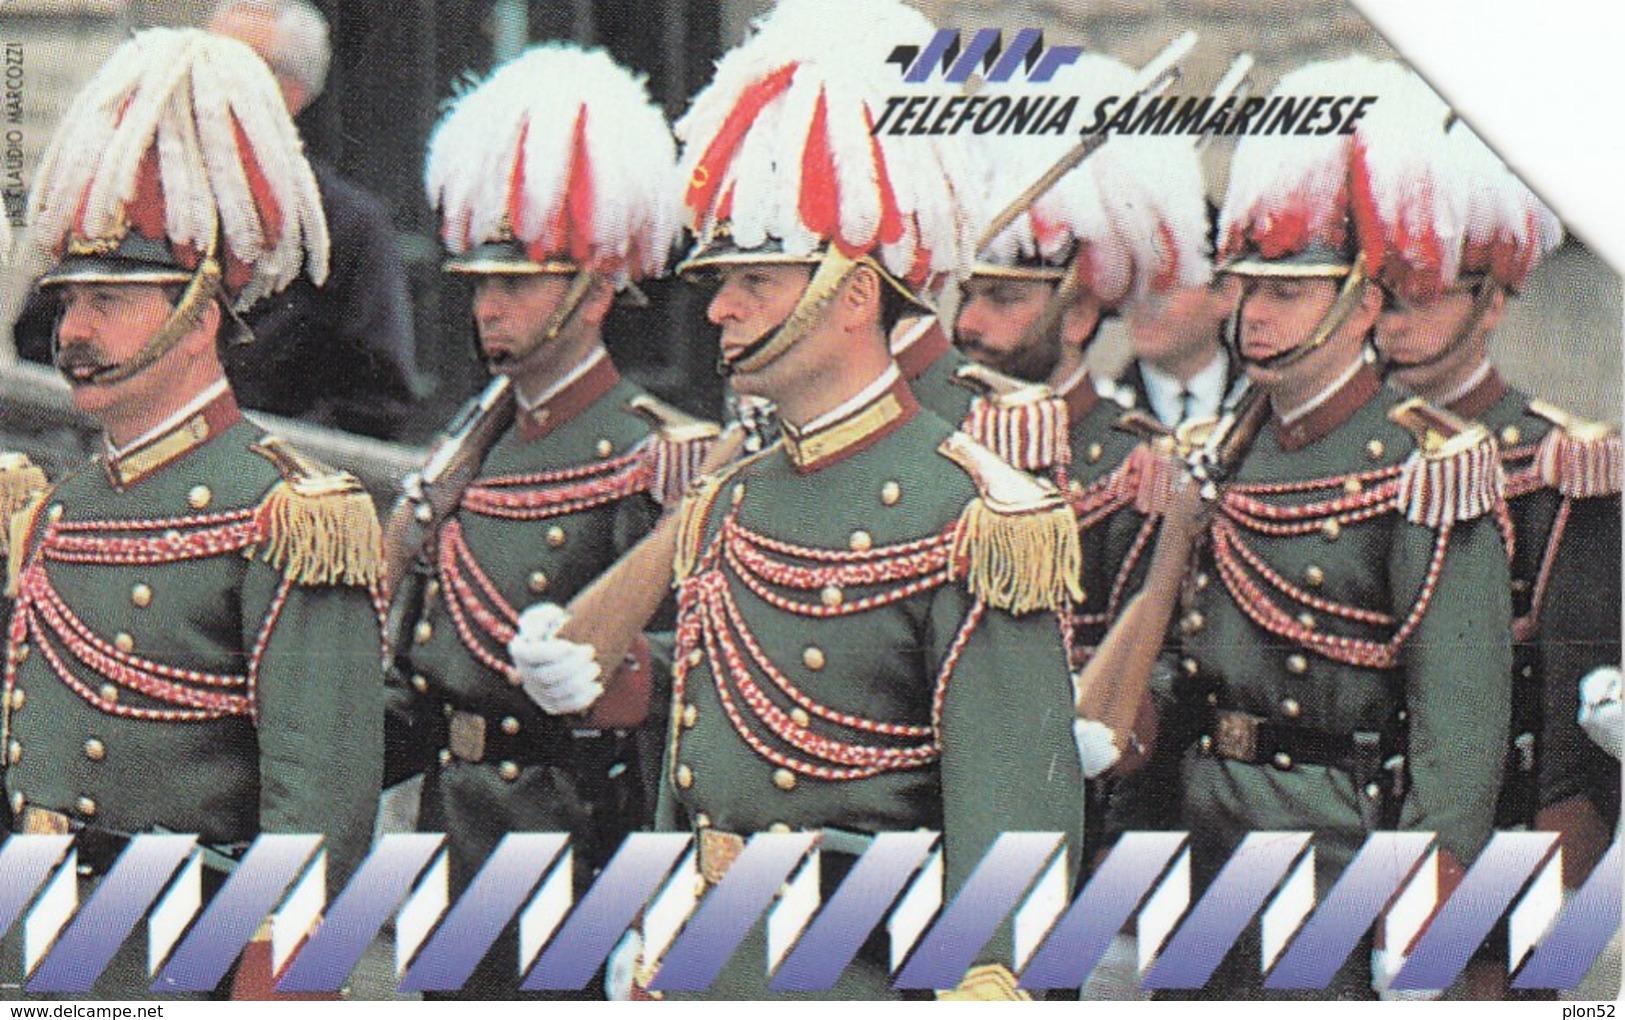 11930 - SCHEDA TELEFONICA DA L.18000 -1994 - S.MARINO - USATA - San Marino